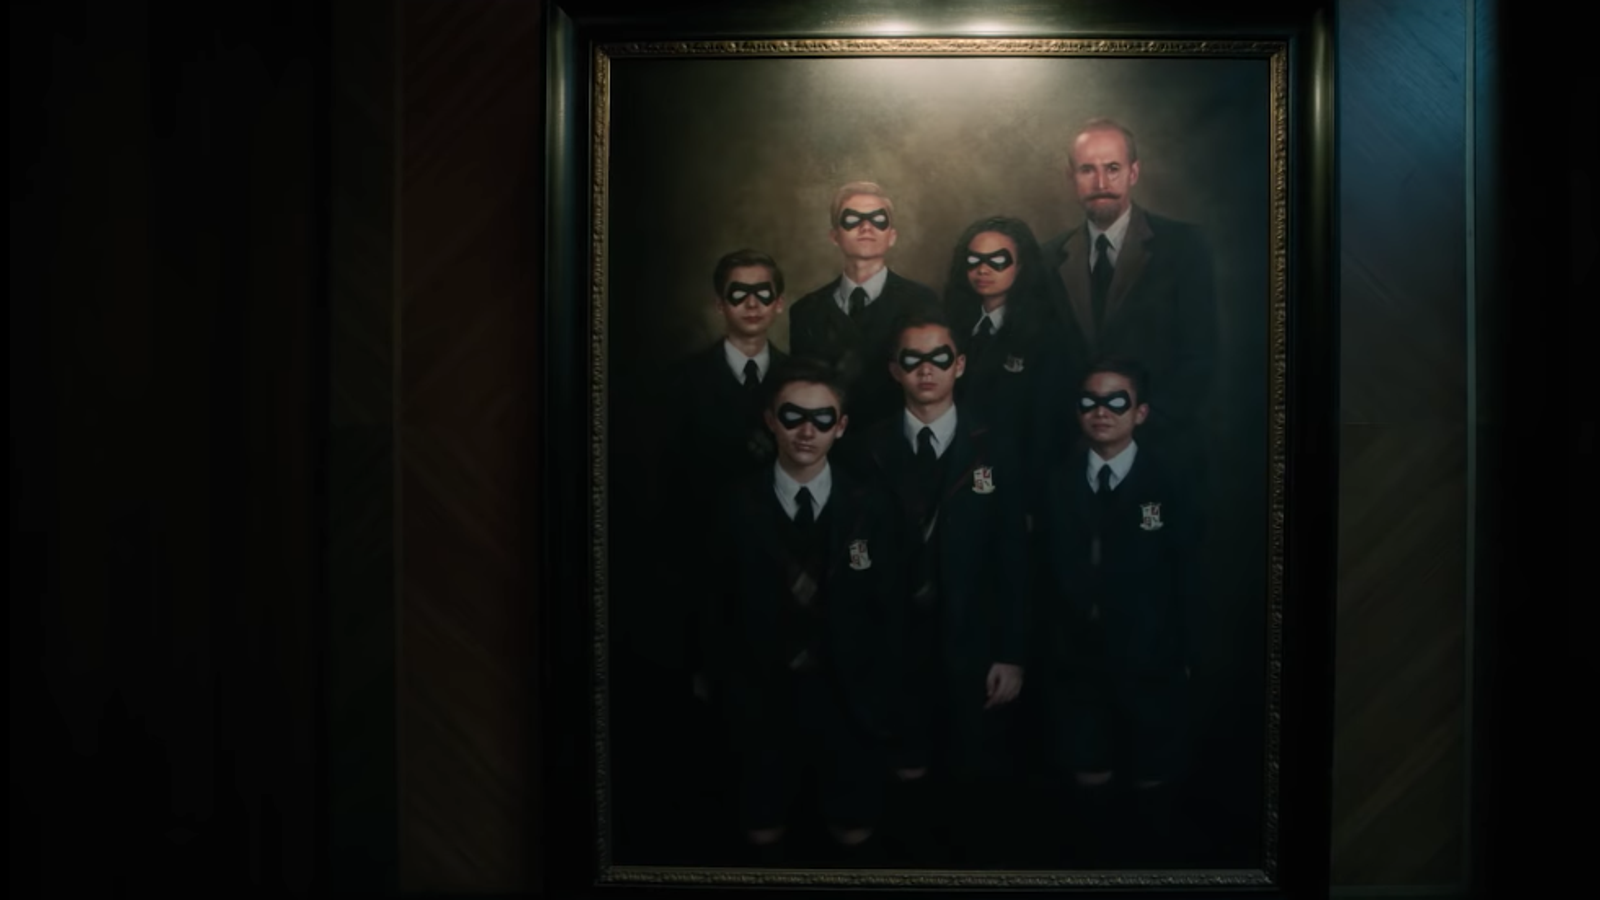 Meet Ellen Page's weird superhero team in the trailer for Netflix's The Umbrella Academy